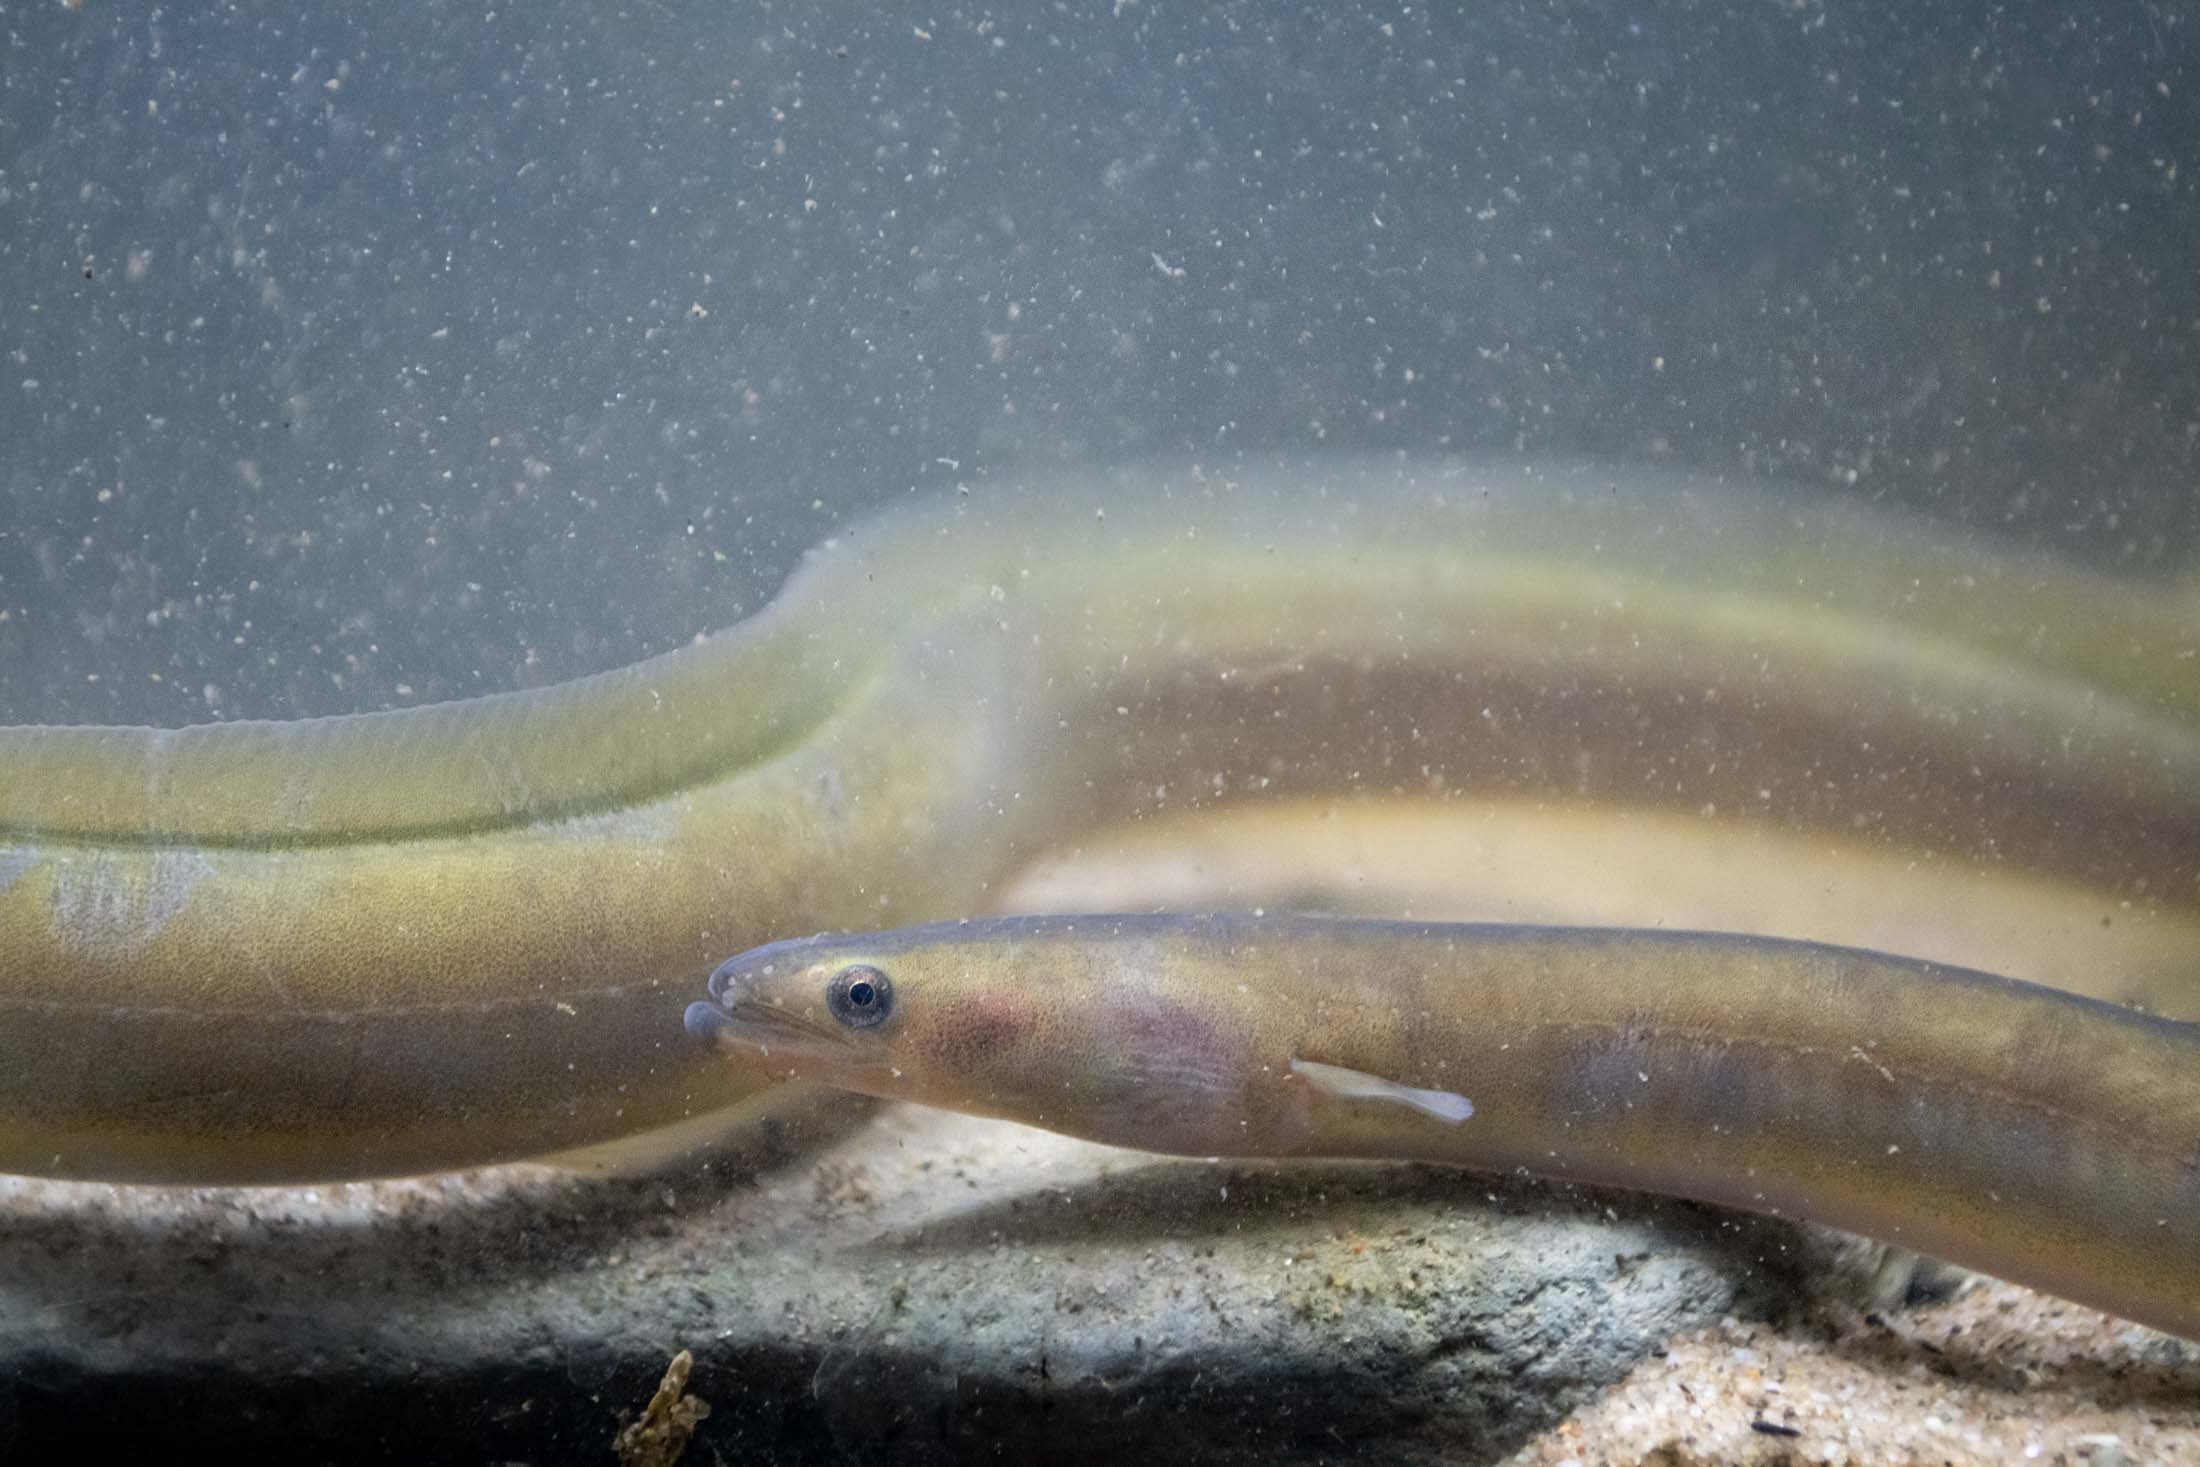 European eel © Jack Perks